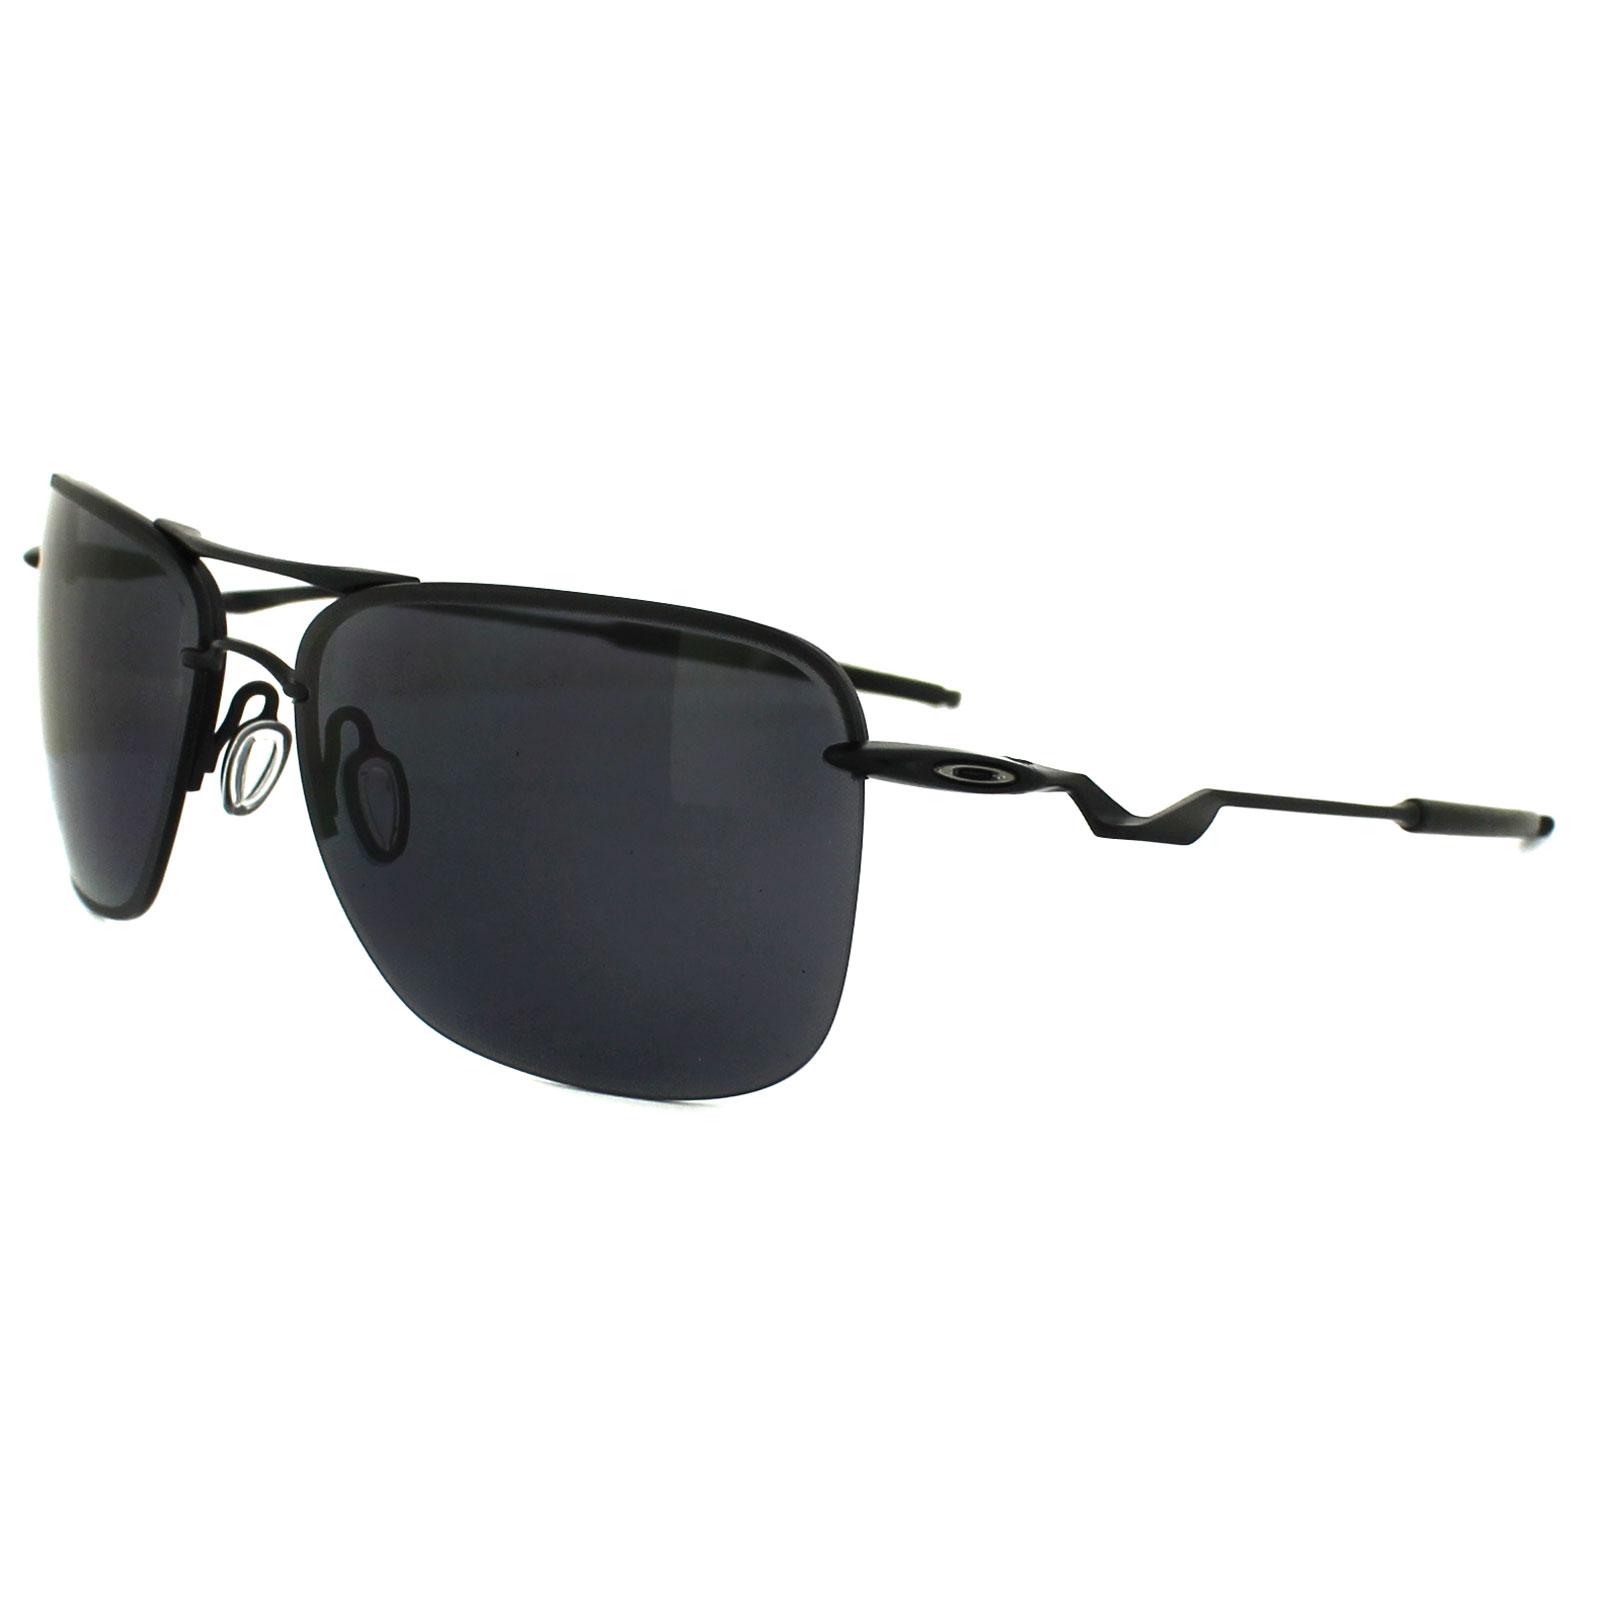 cheap real oakleys  Cheap Oakley Tailhook Sunglasses - Discounted Sunglasses